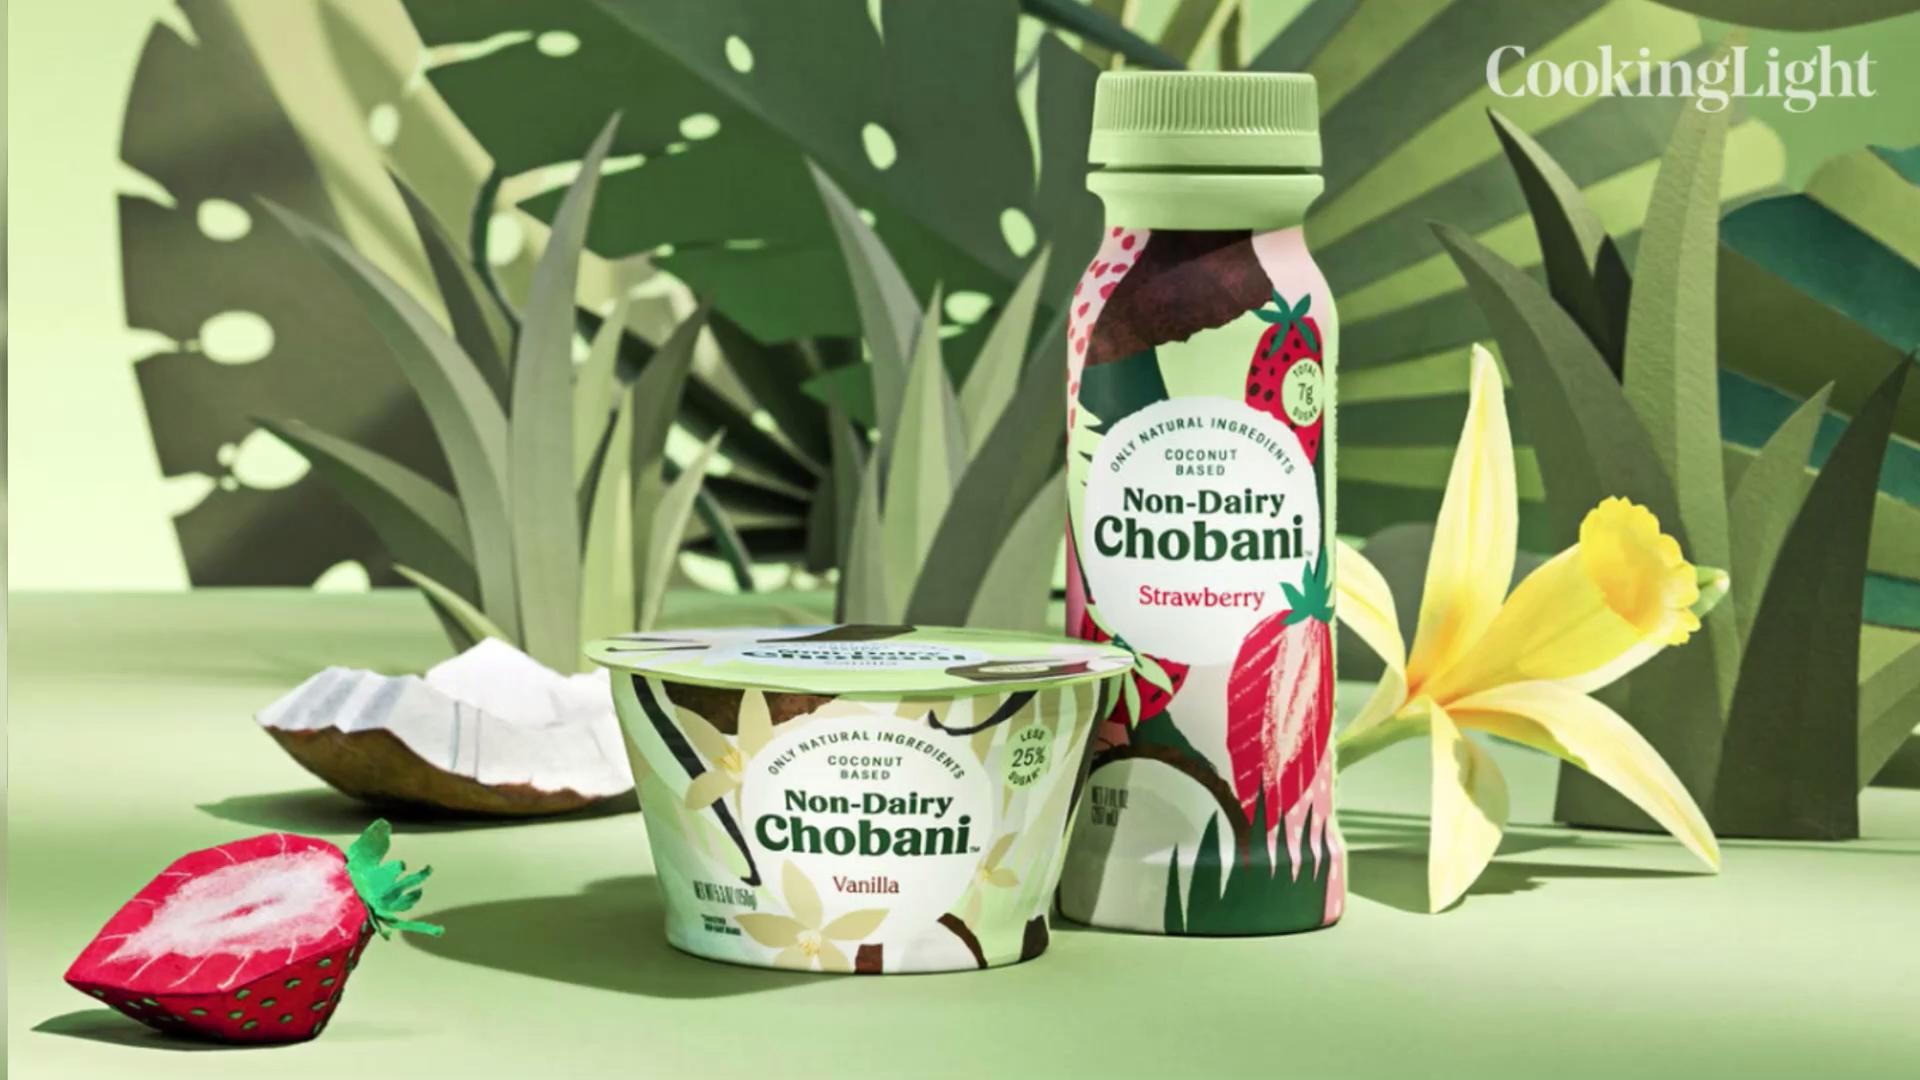 Chobani Launches New Vegan Plant-Based